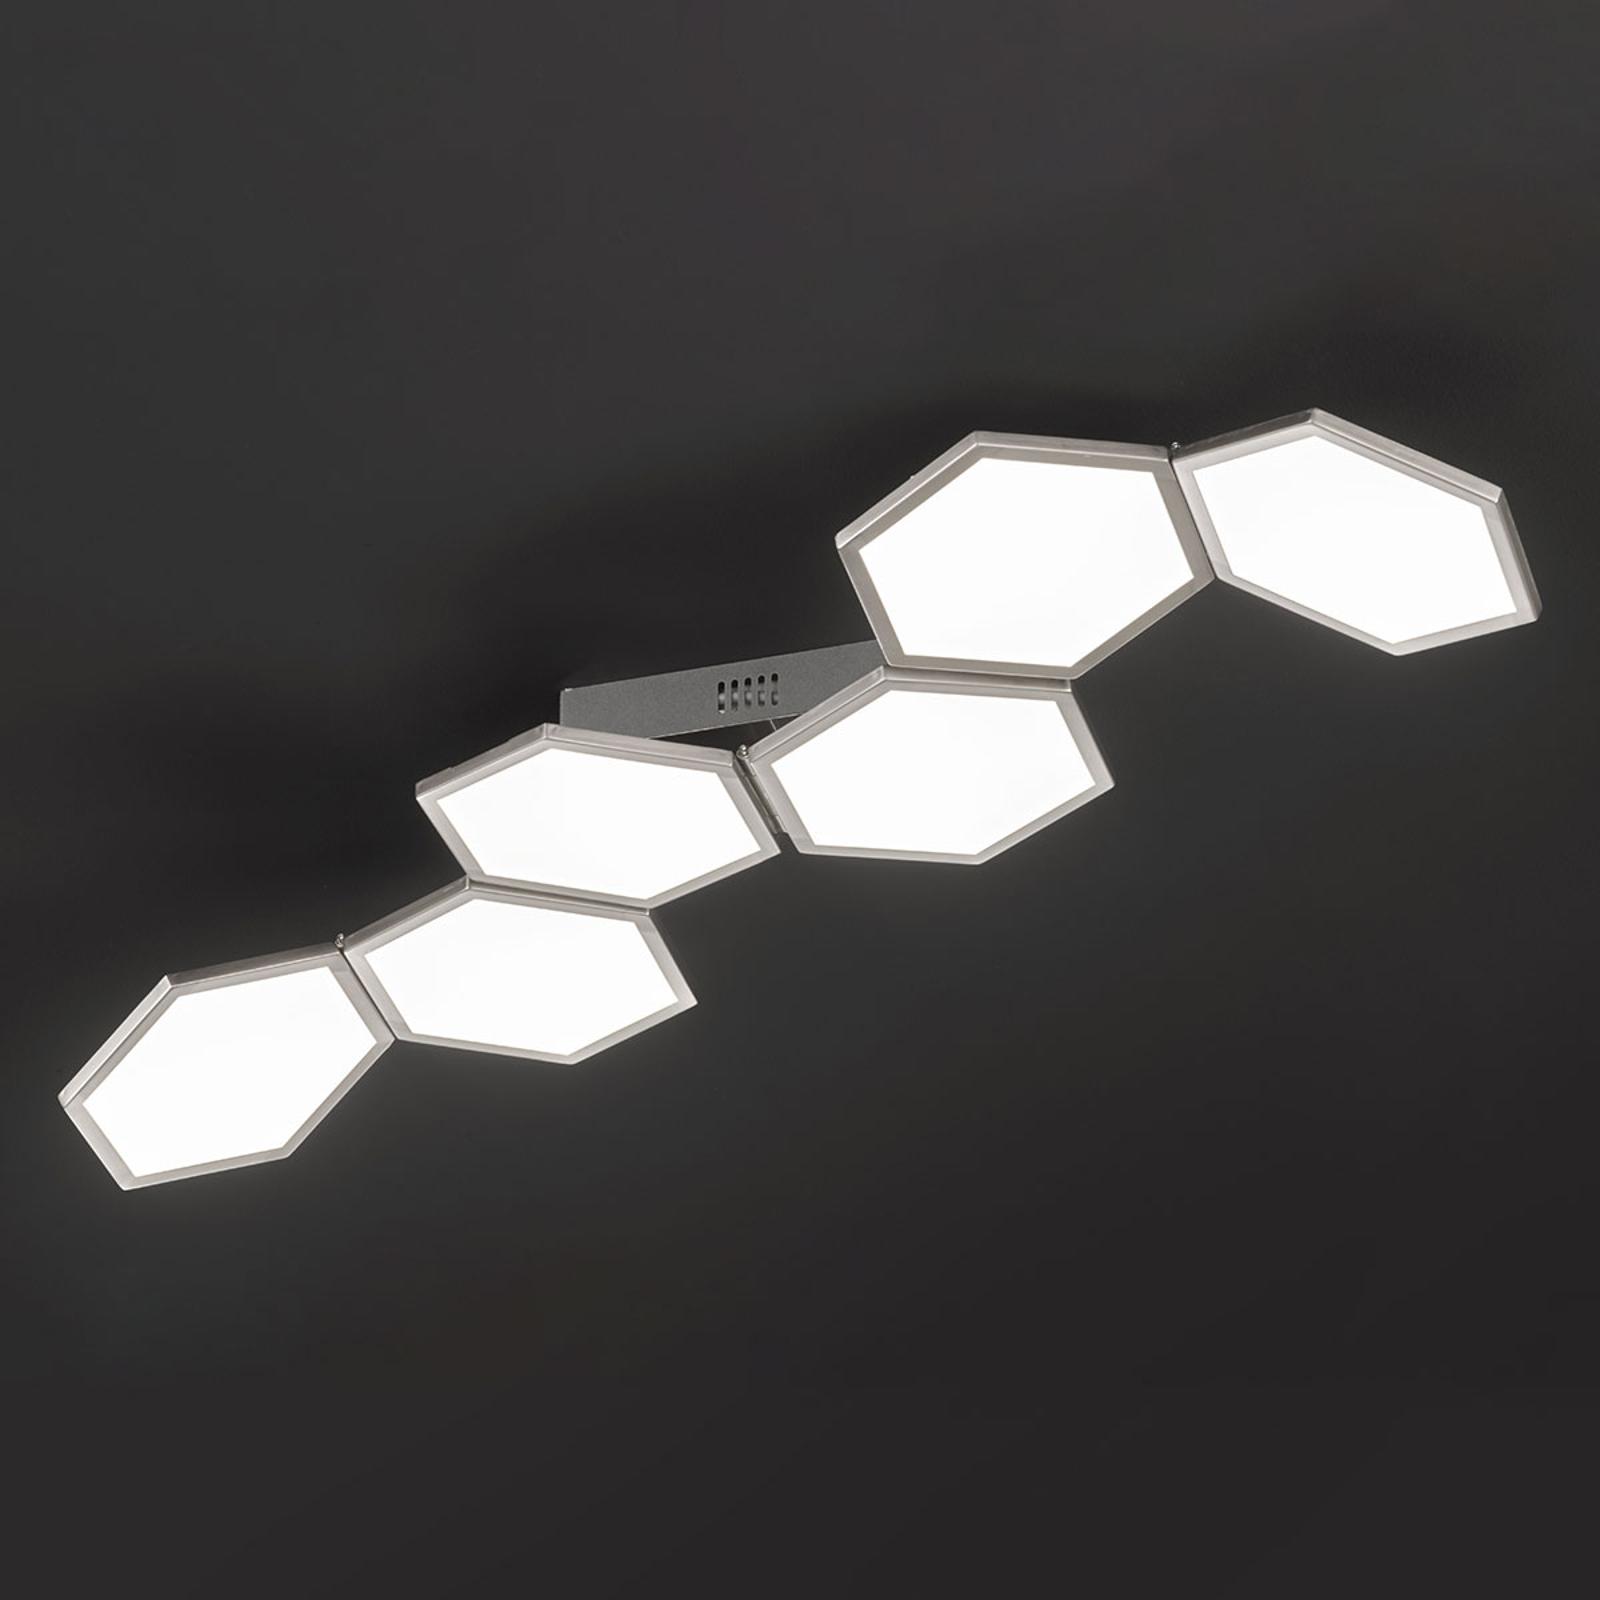 Dimbar LED-taklampe Signe, justerbar